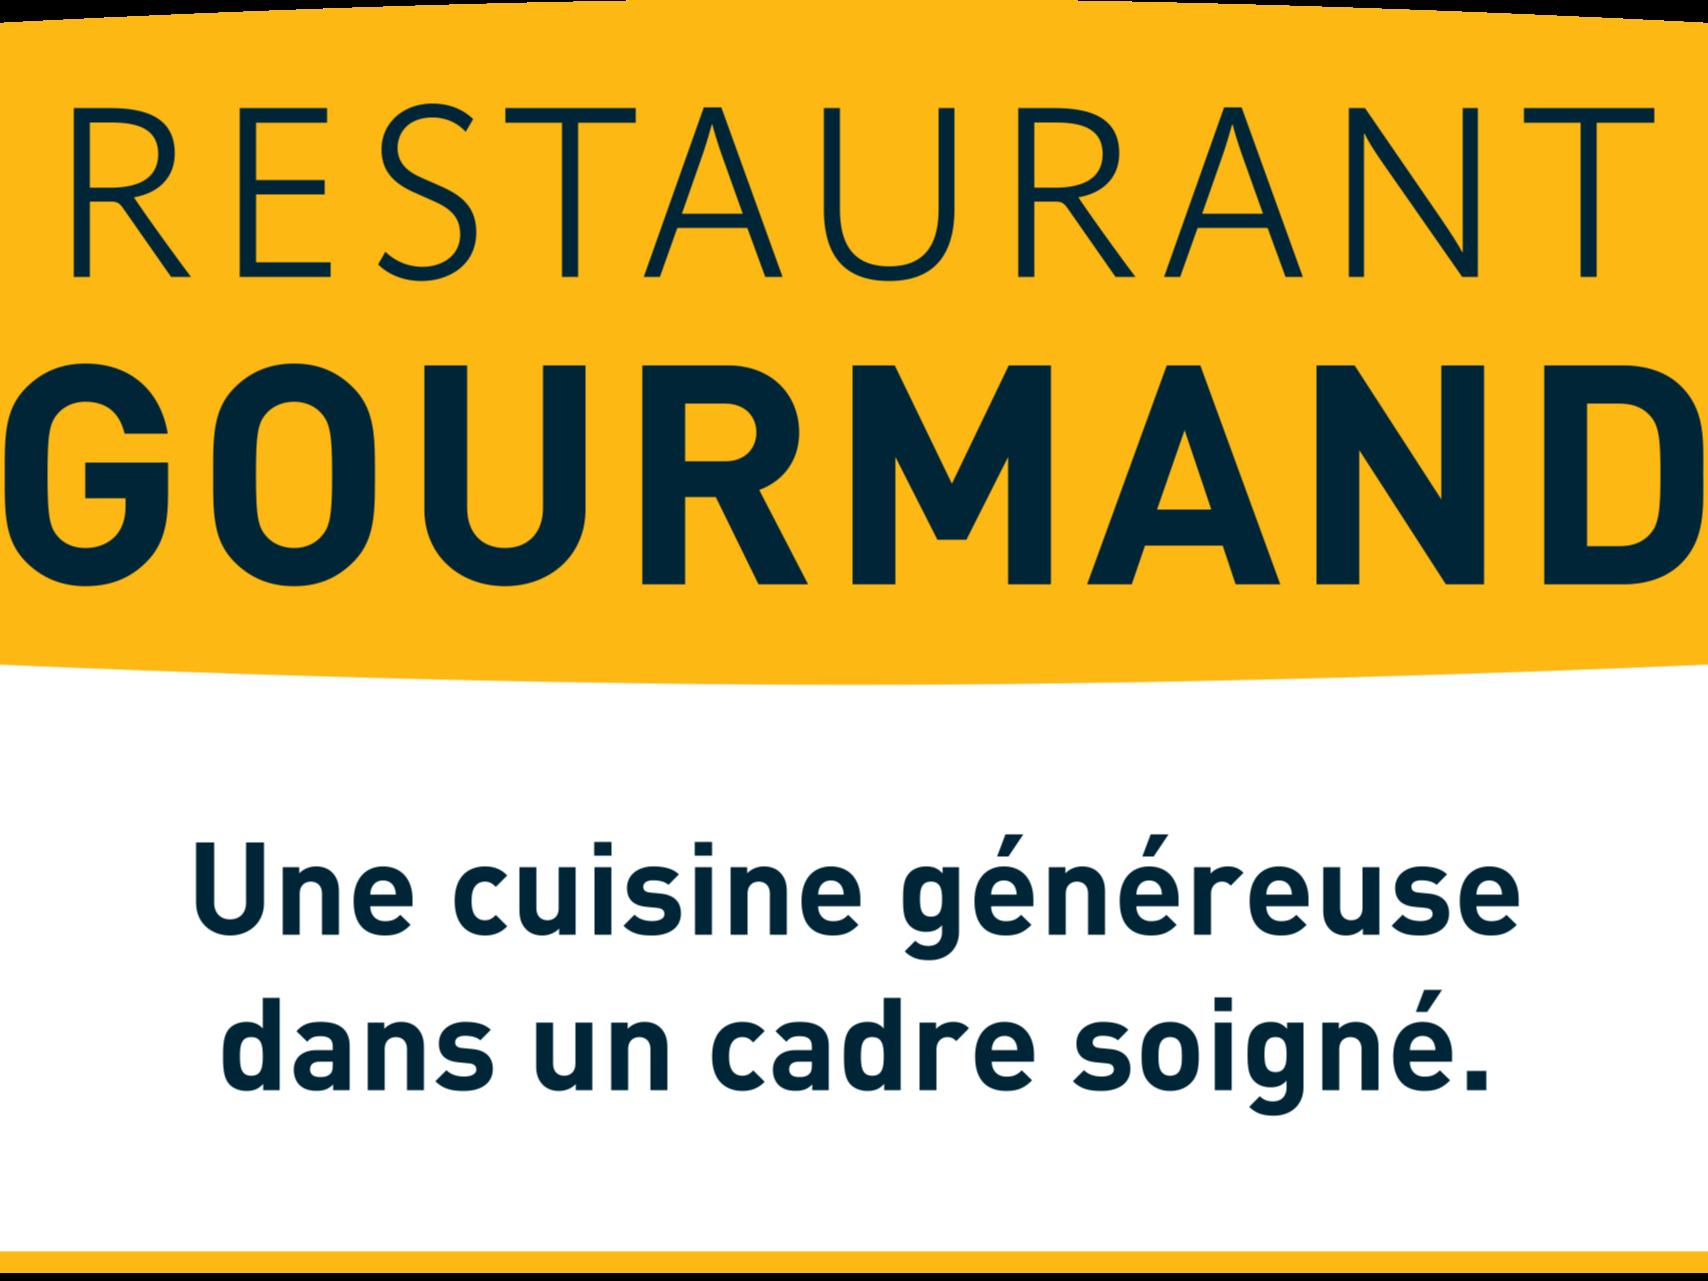 RESTAURANT GOURMAND TEXTE (002)